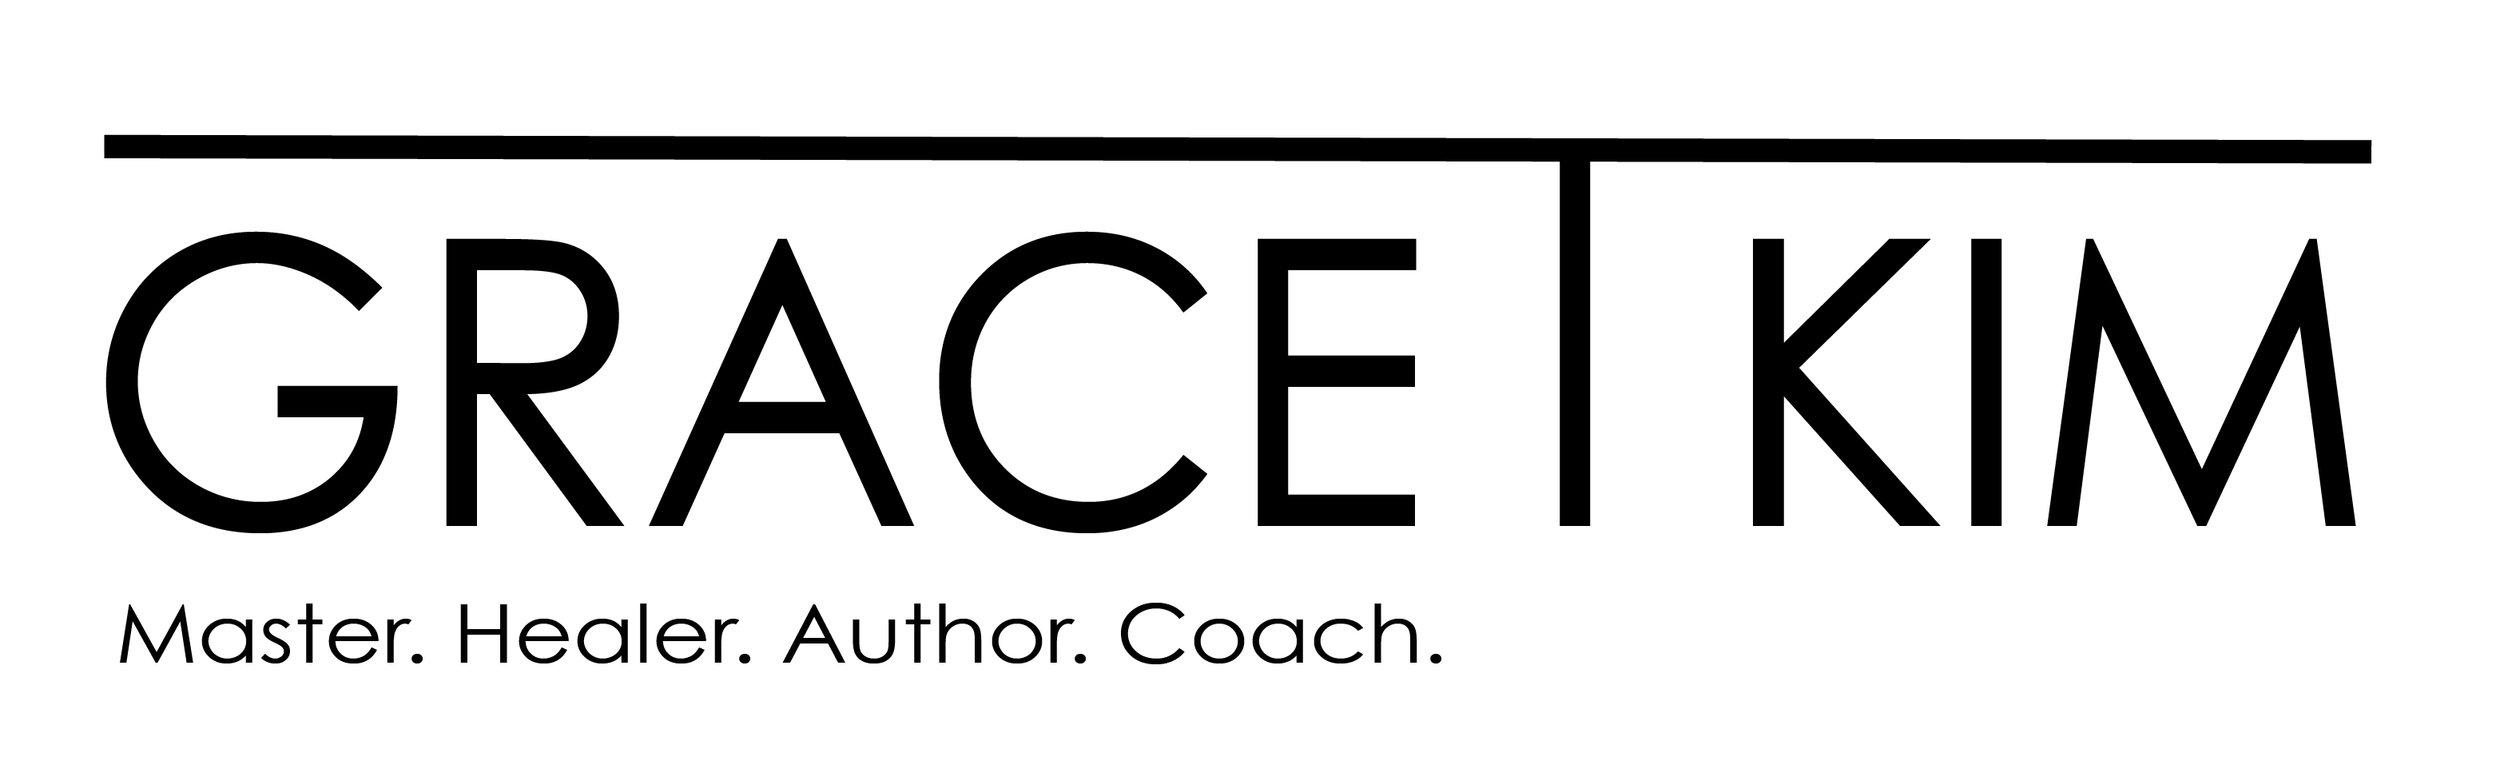 Grace T Kim, Master, Healer, Author and Coach. Partner of Ludovic